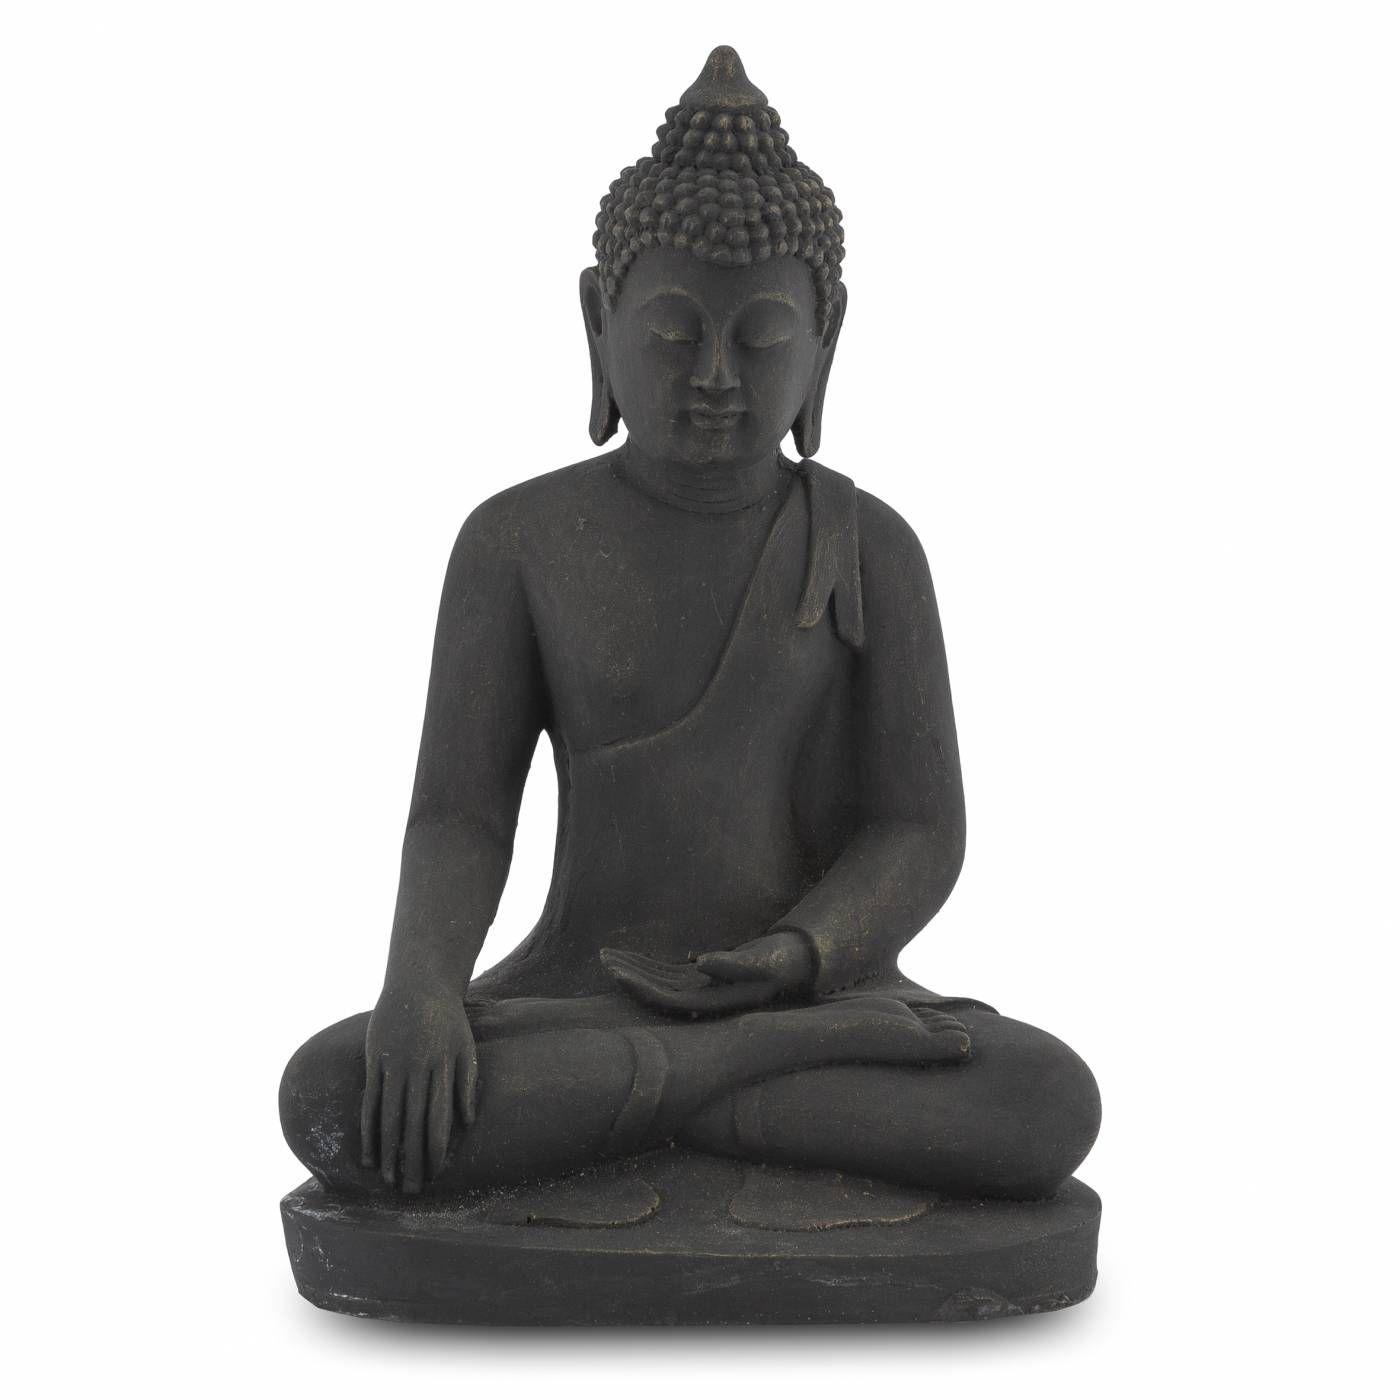 Escultura Buda Zen Hindu Namastê Tailandês Tibetano Sidarta em Resina